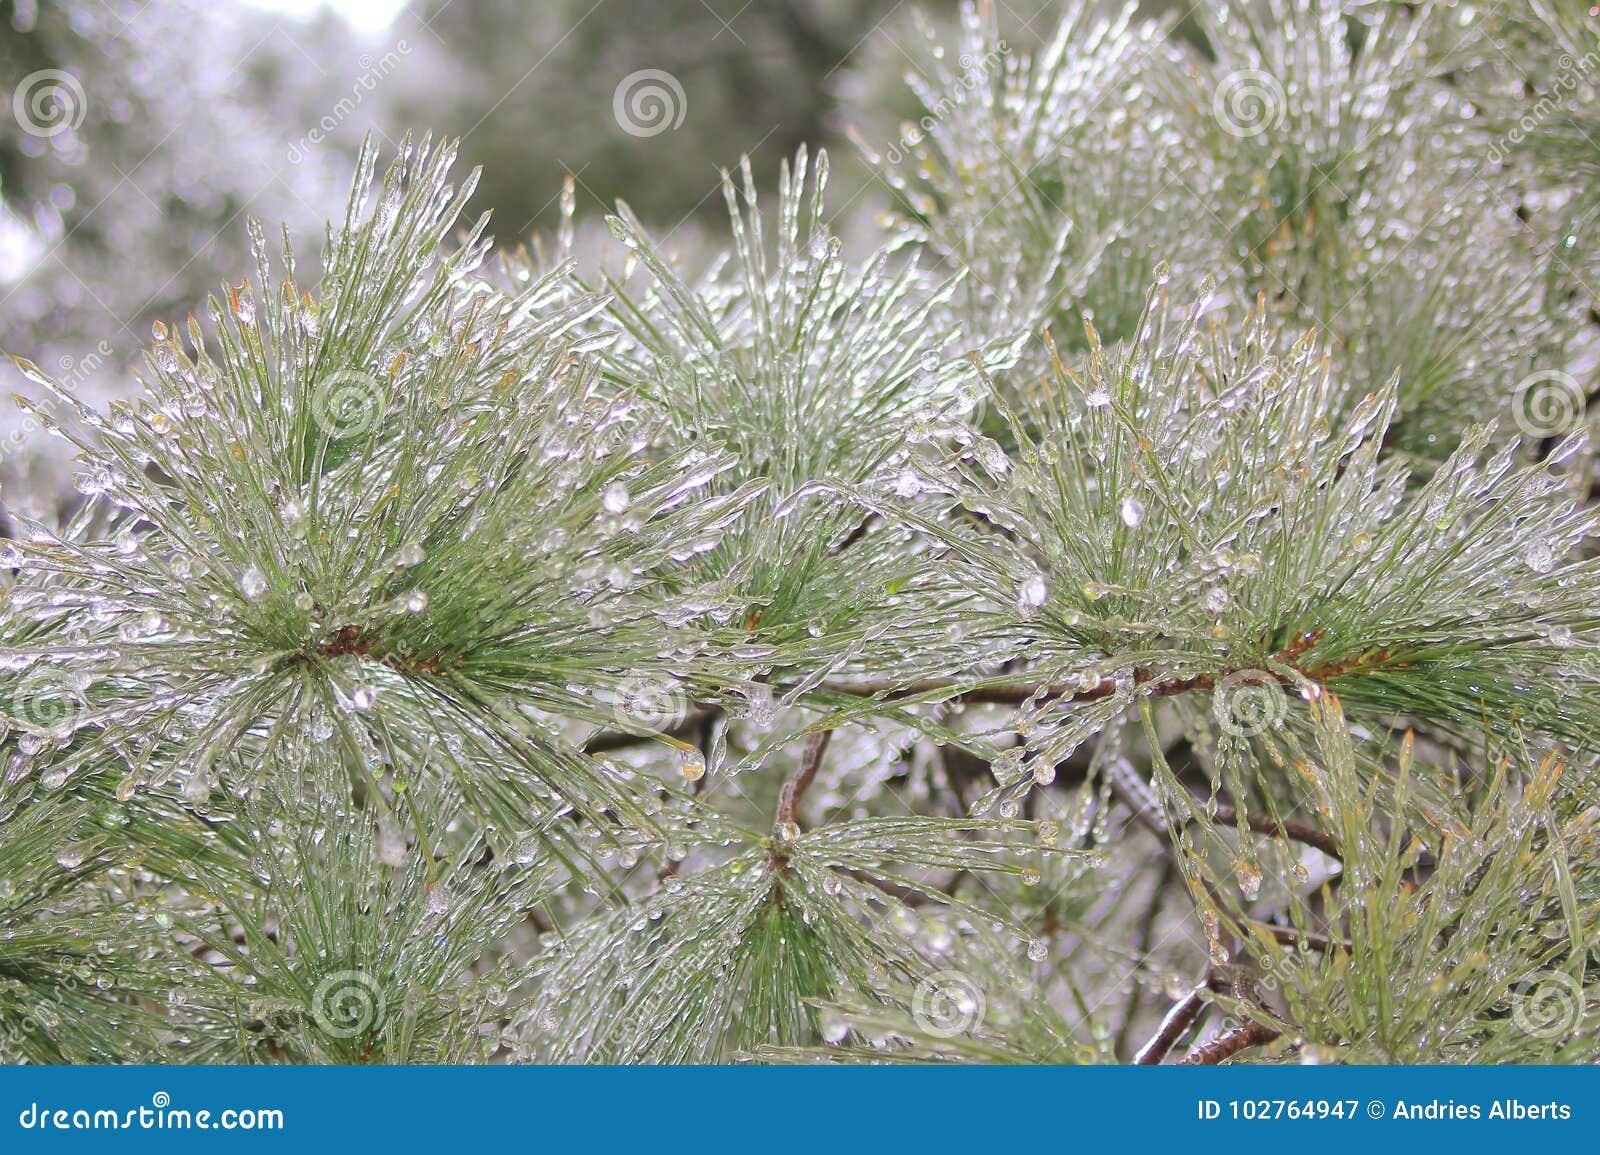 Winter Ice - Cold Weather Background - Pine Tree Needle